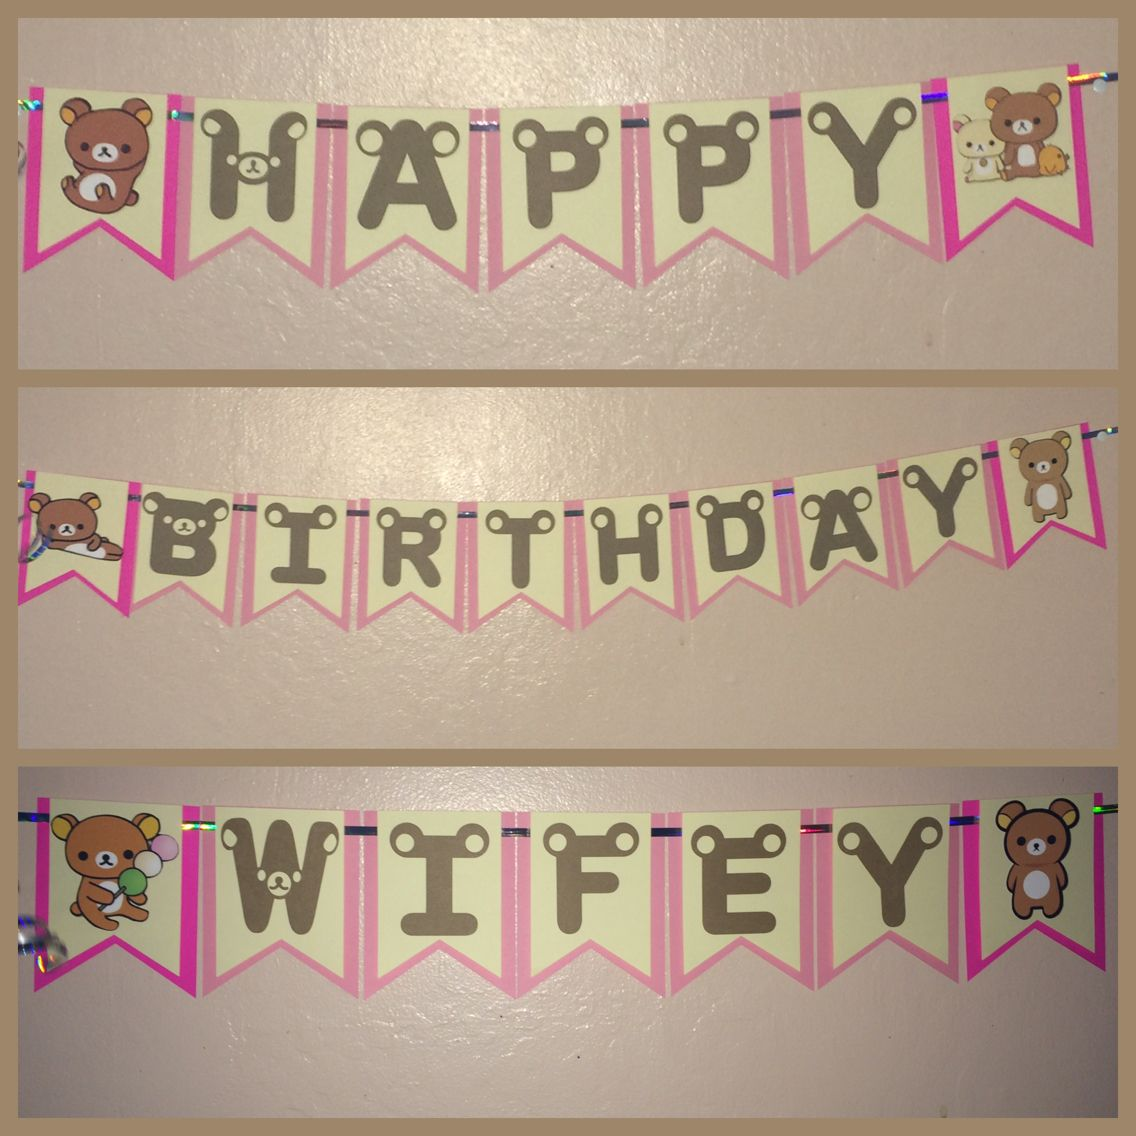 white vinyl letters see more rilakkuma bear birthday banner birthday rilakkuma bear diy banner cricut